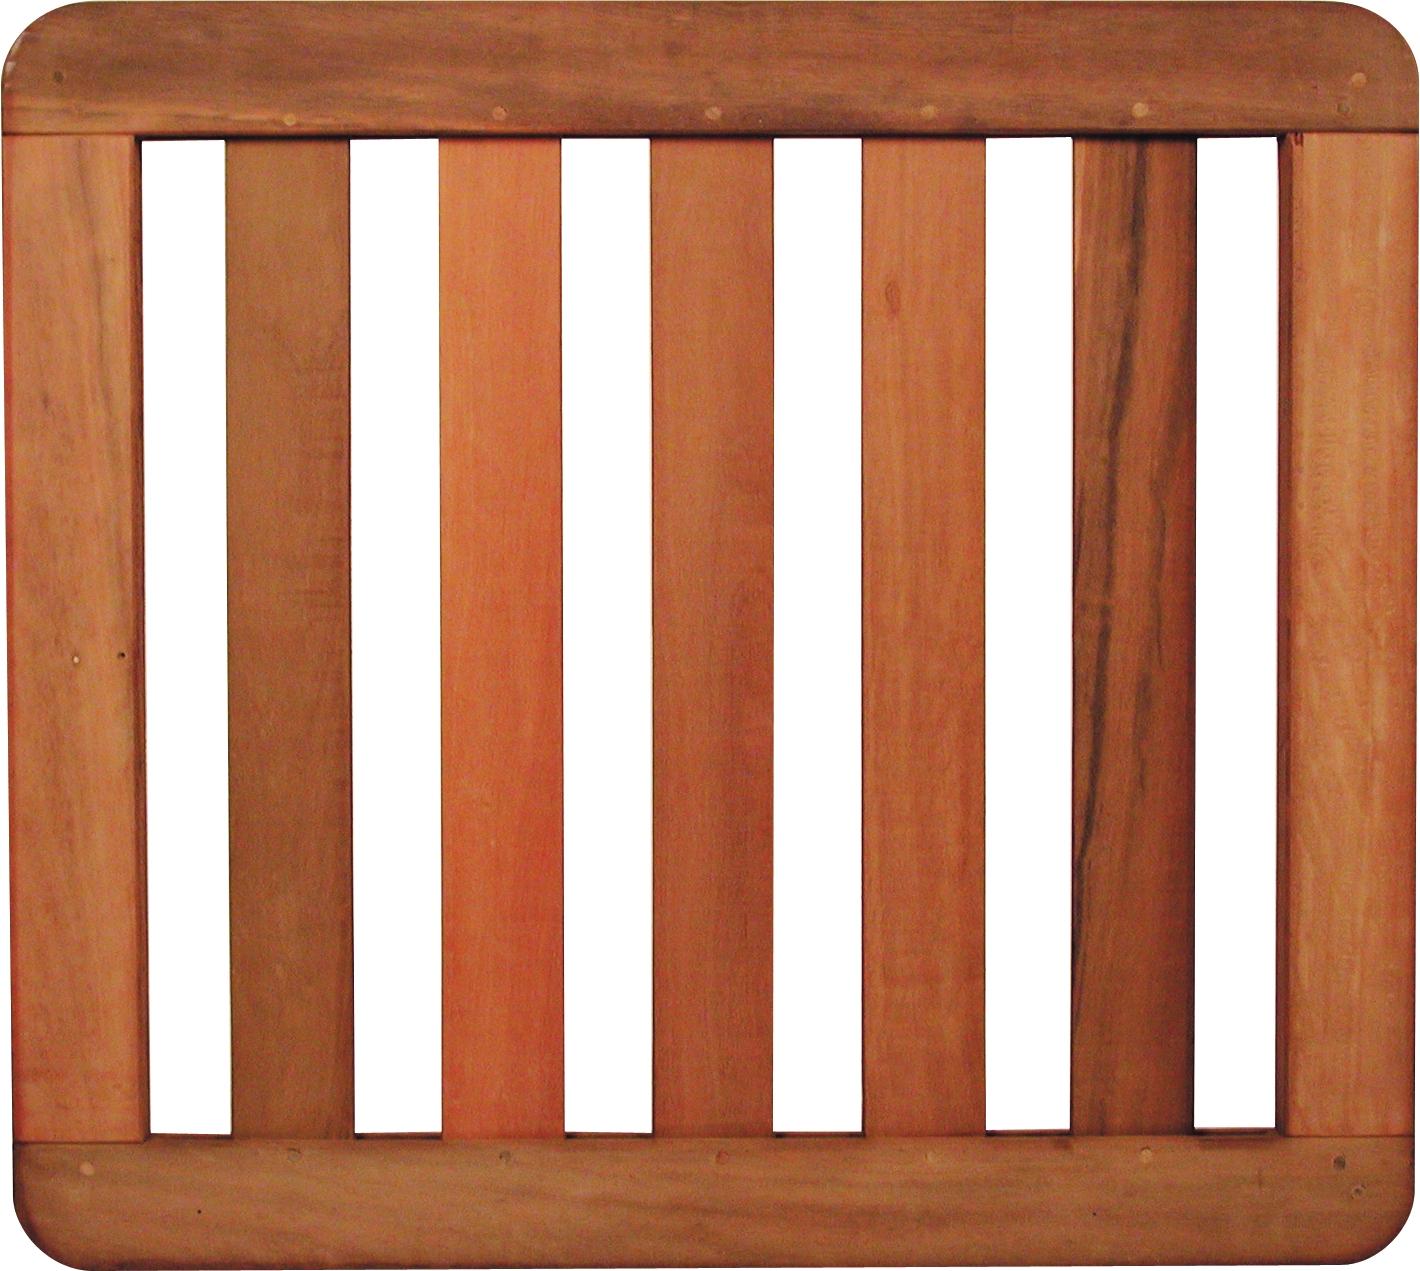 Felixwood | Hekpoort 11 | Bangkirai | 90 x 100 cm